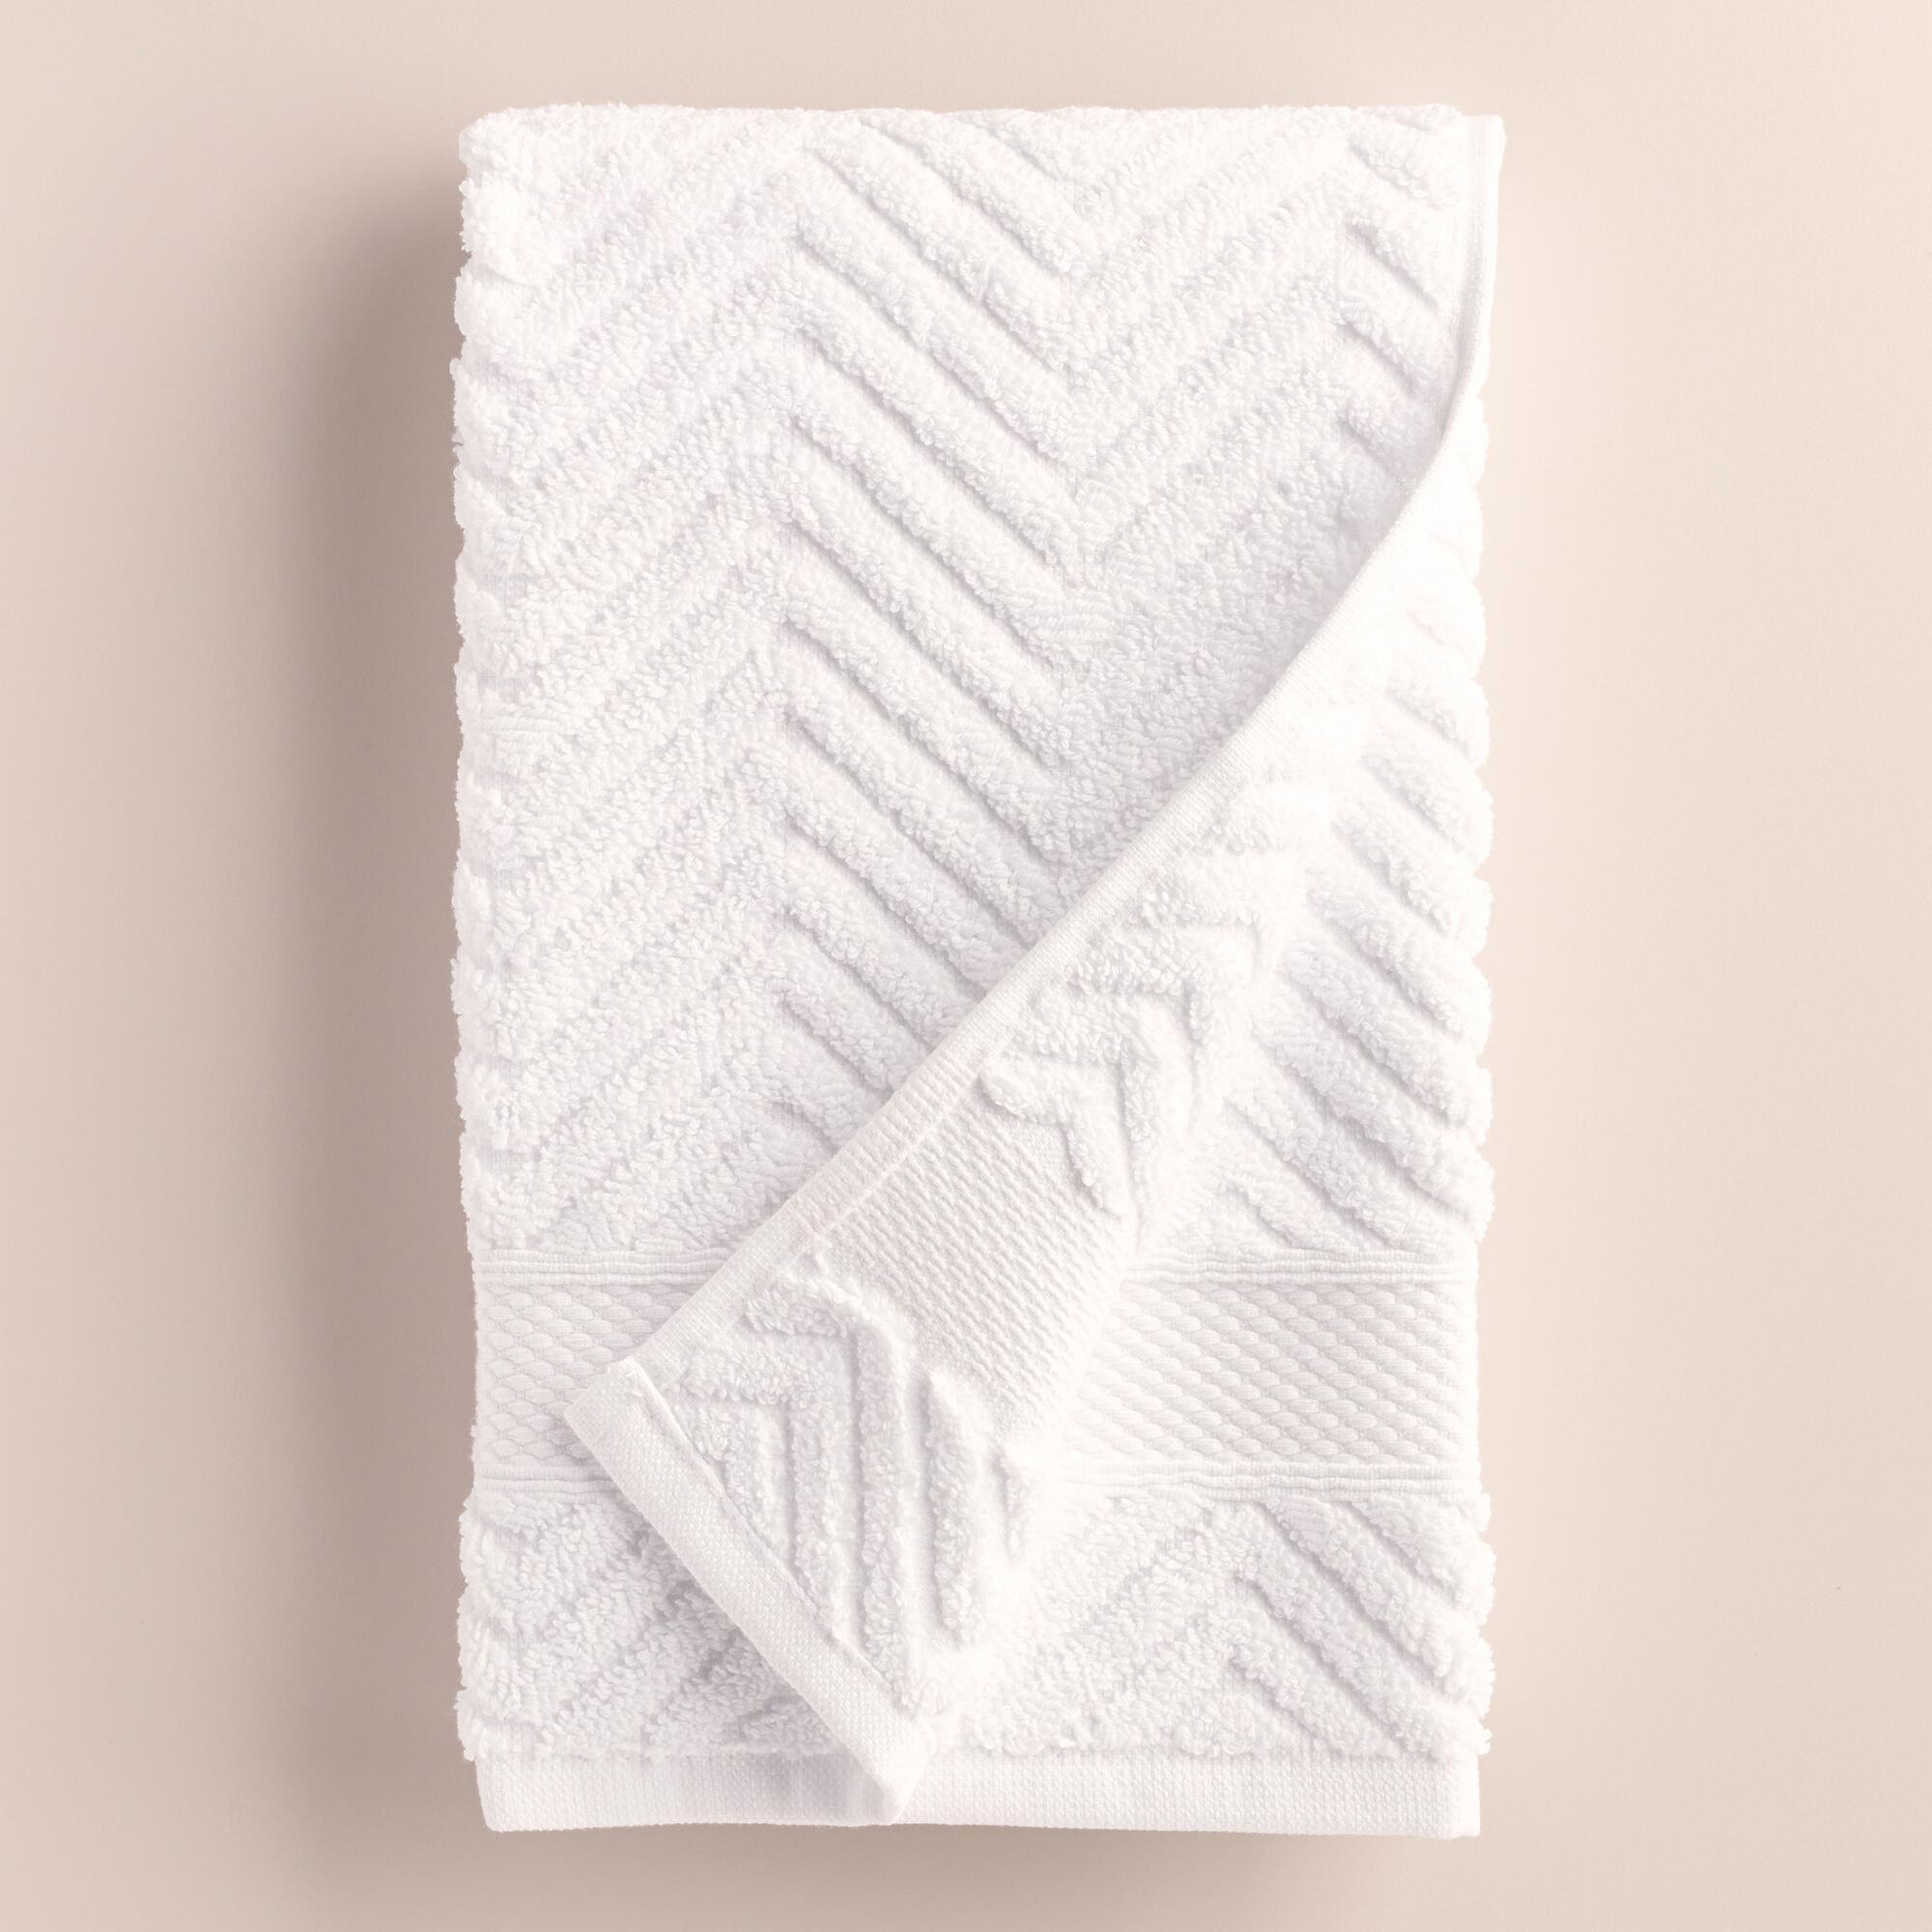 White Chevron Spa Hand Towel | World Market